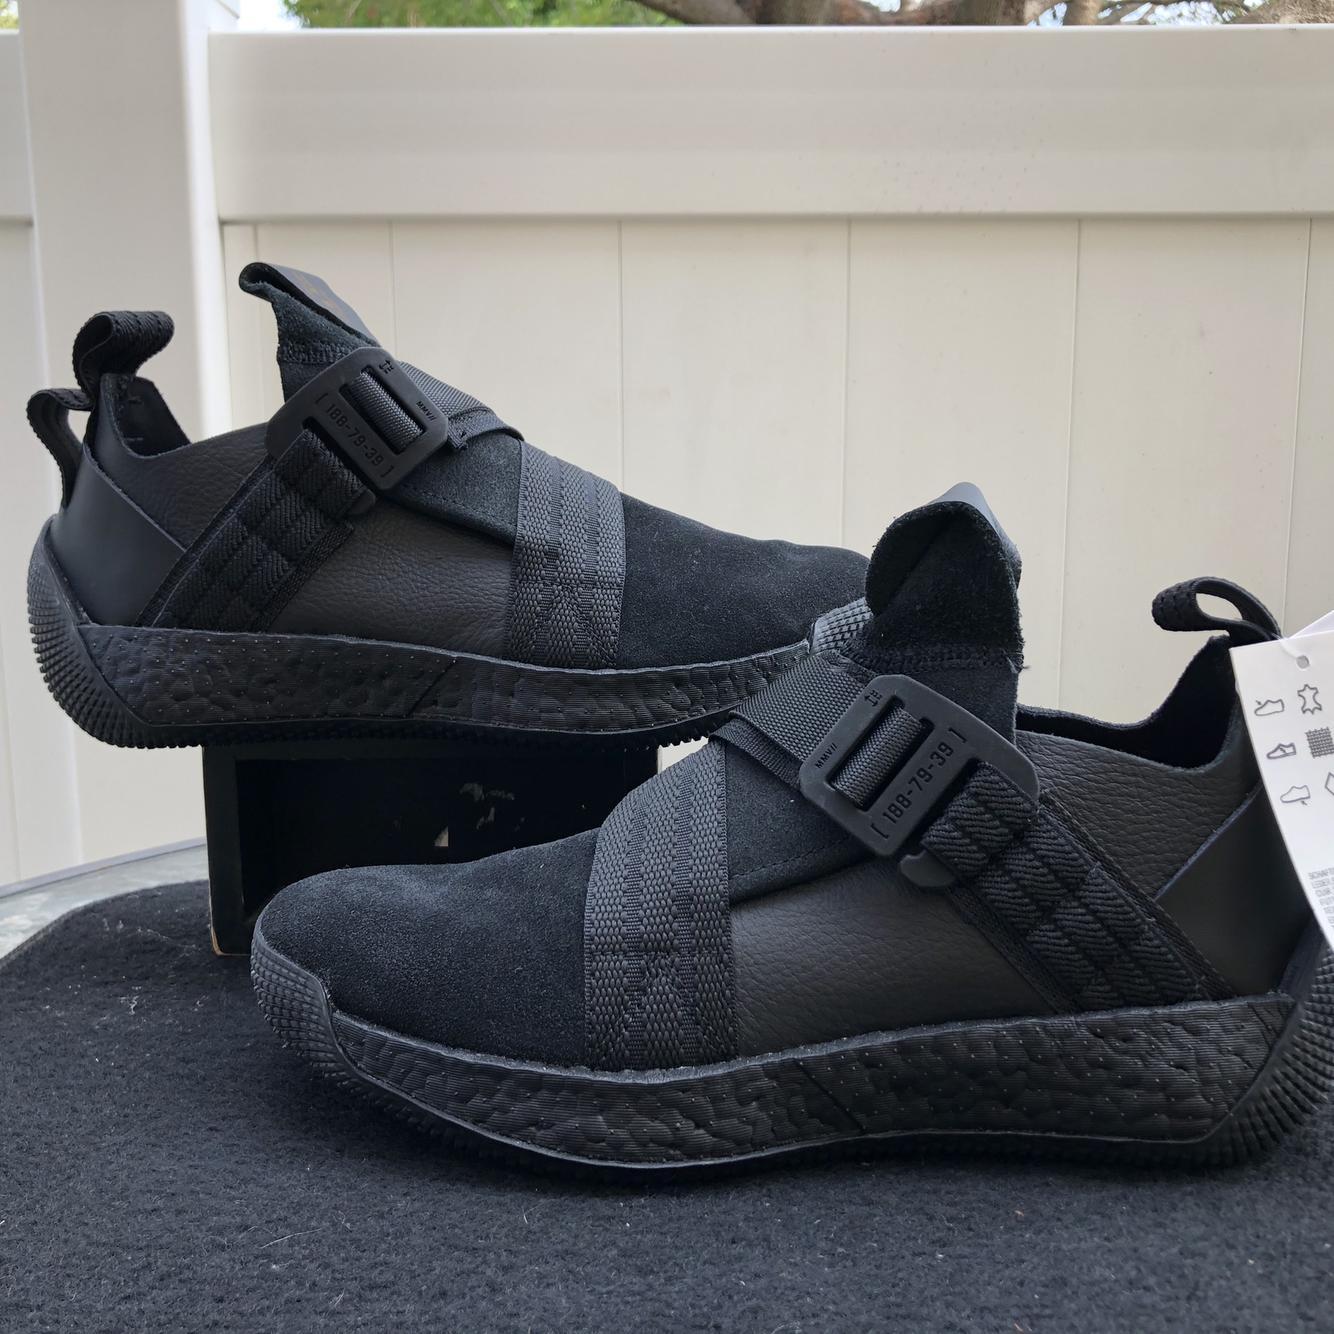 Adidas NEW harden Vol. 2 LS buckle